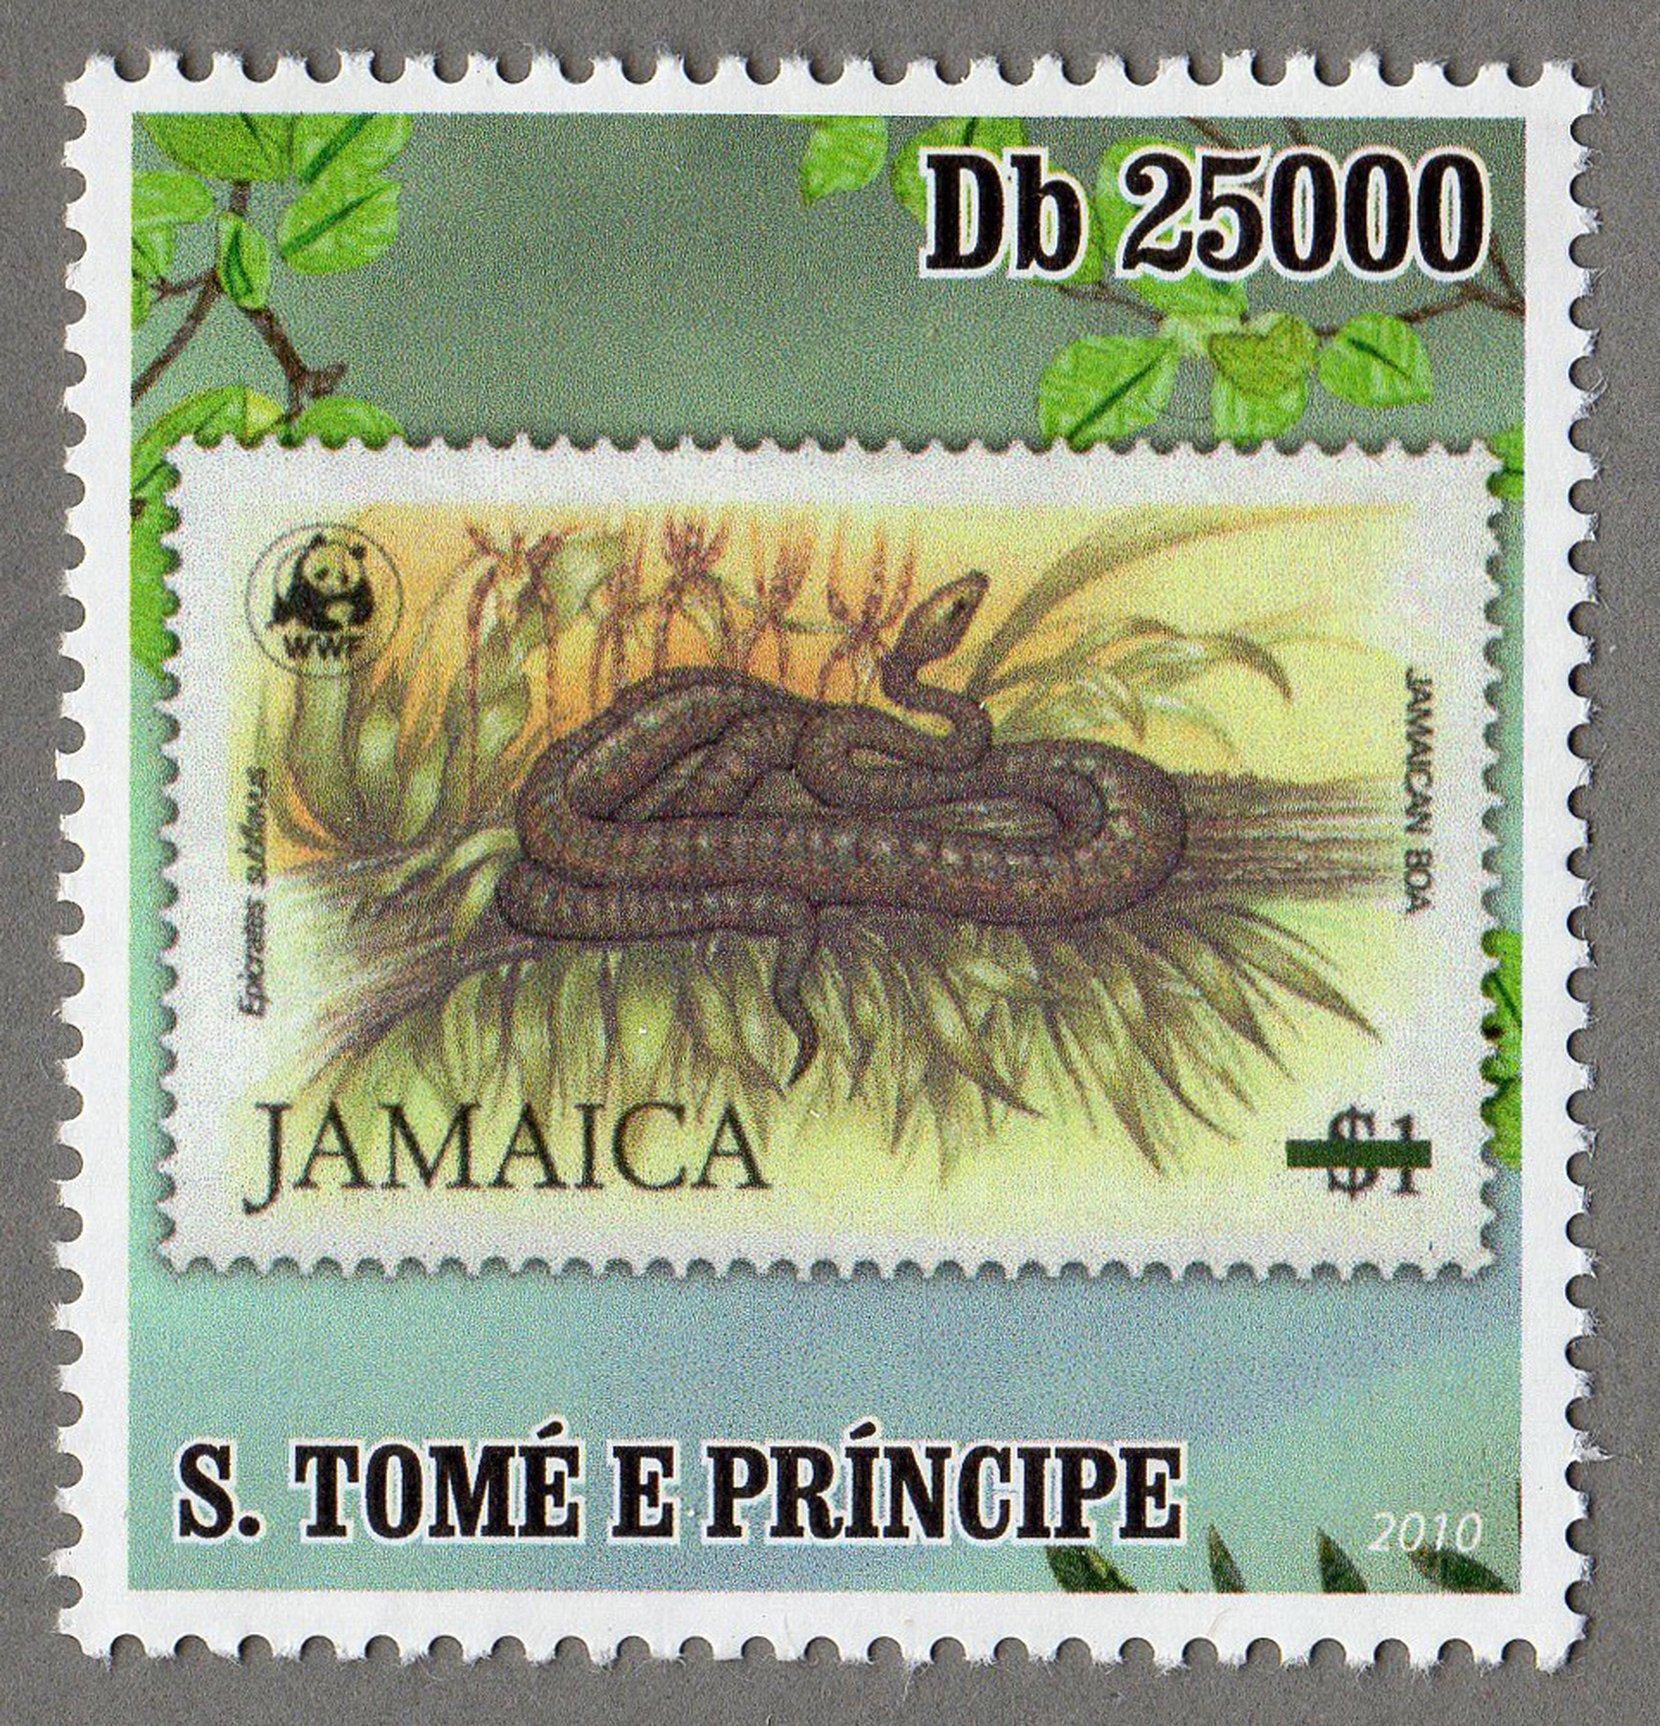 jamaica – jamaican boa s.tome e principe stamp (2) philately postage stamps